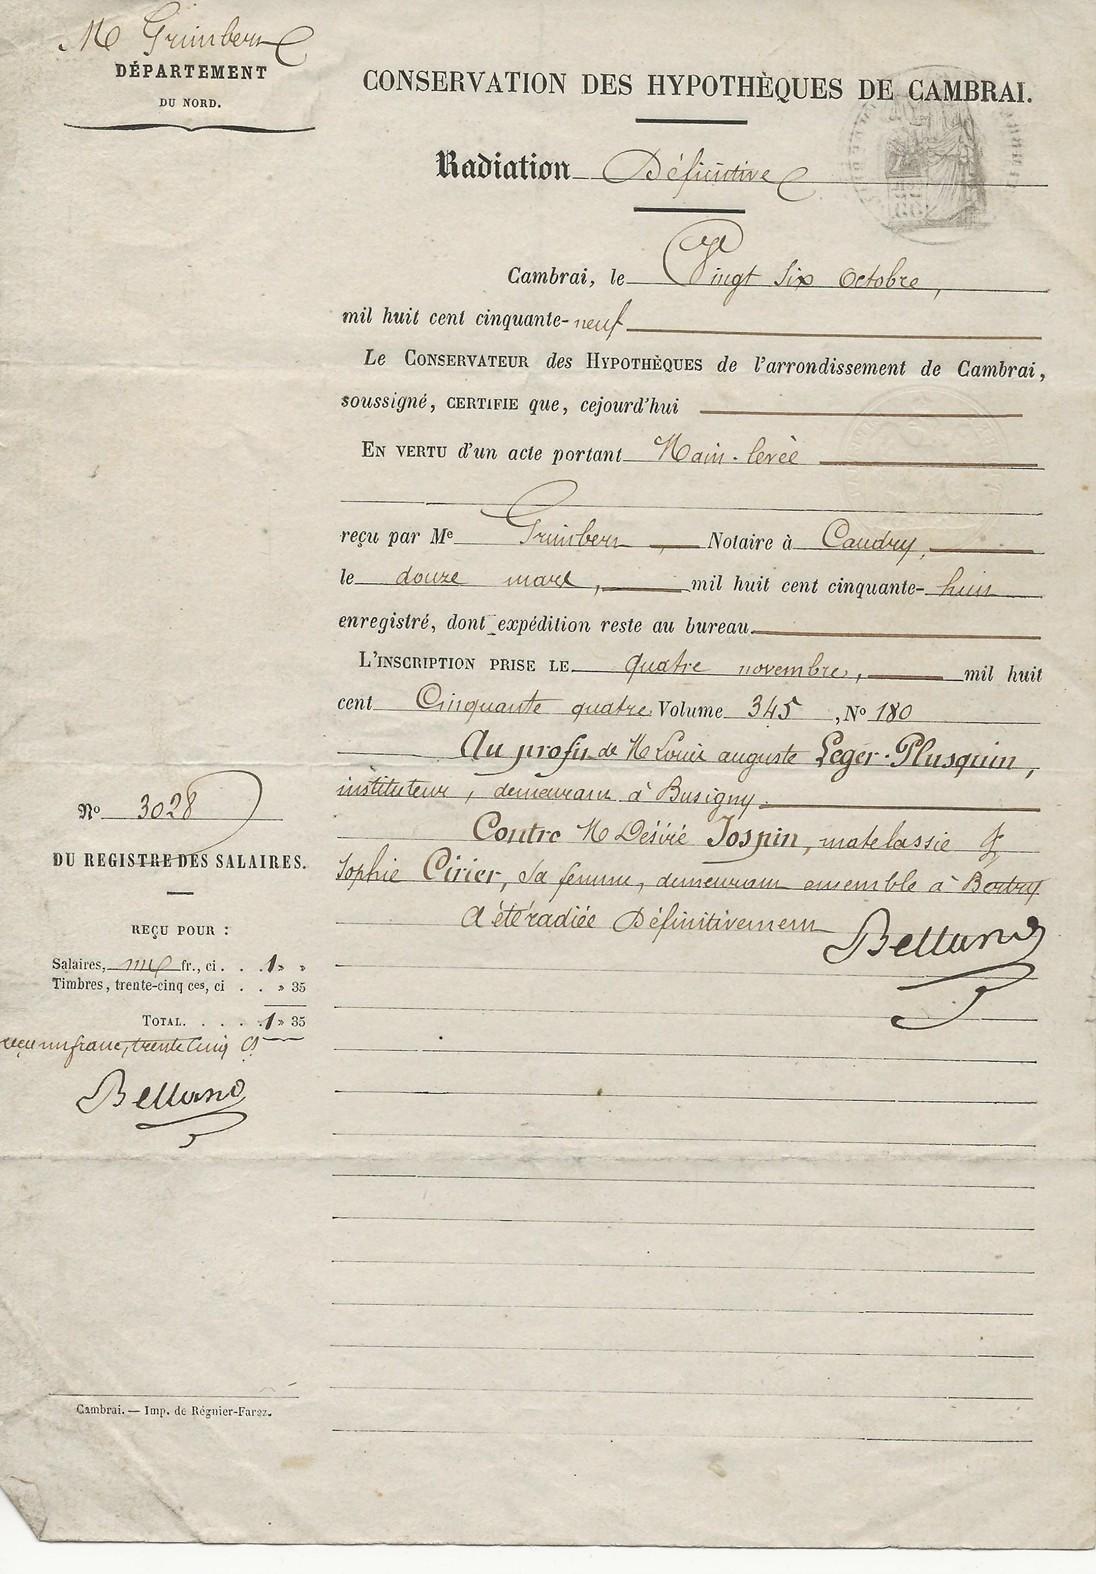 1859 main levee hypotheque desire jospin louis leger 001